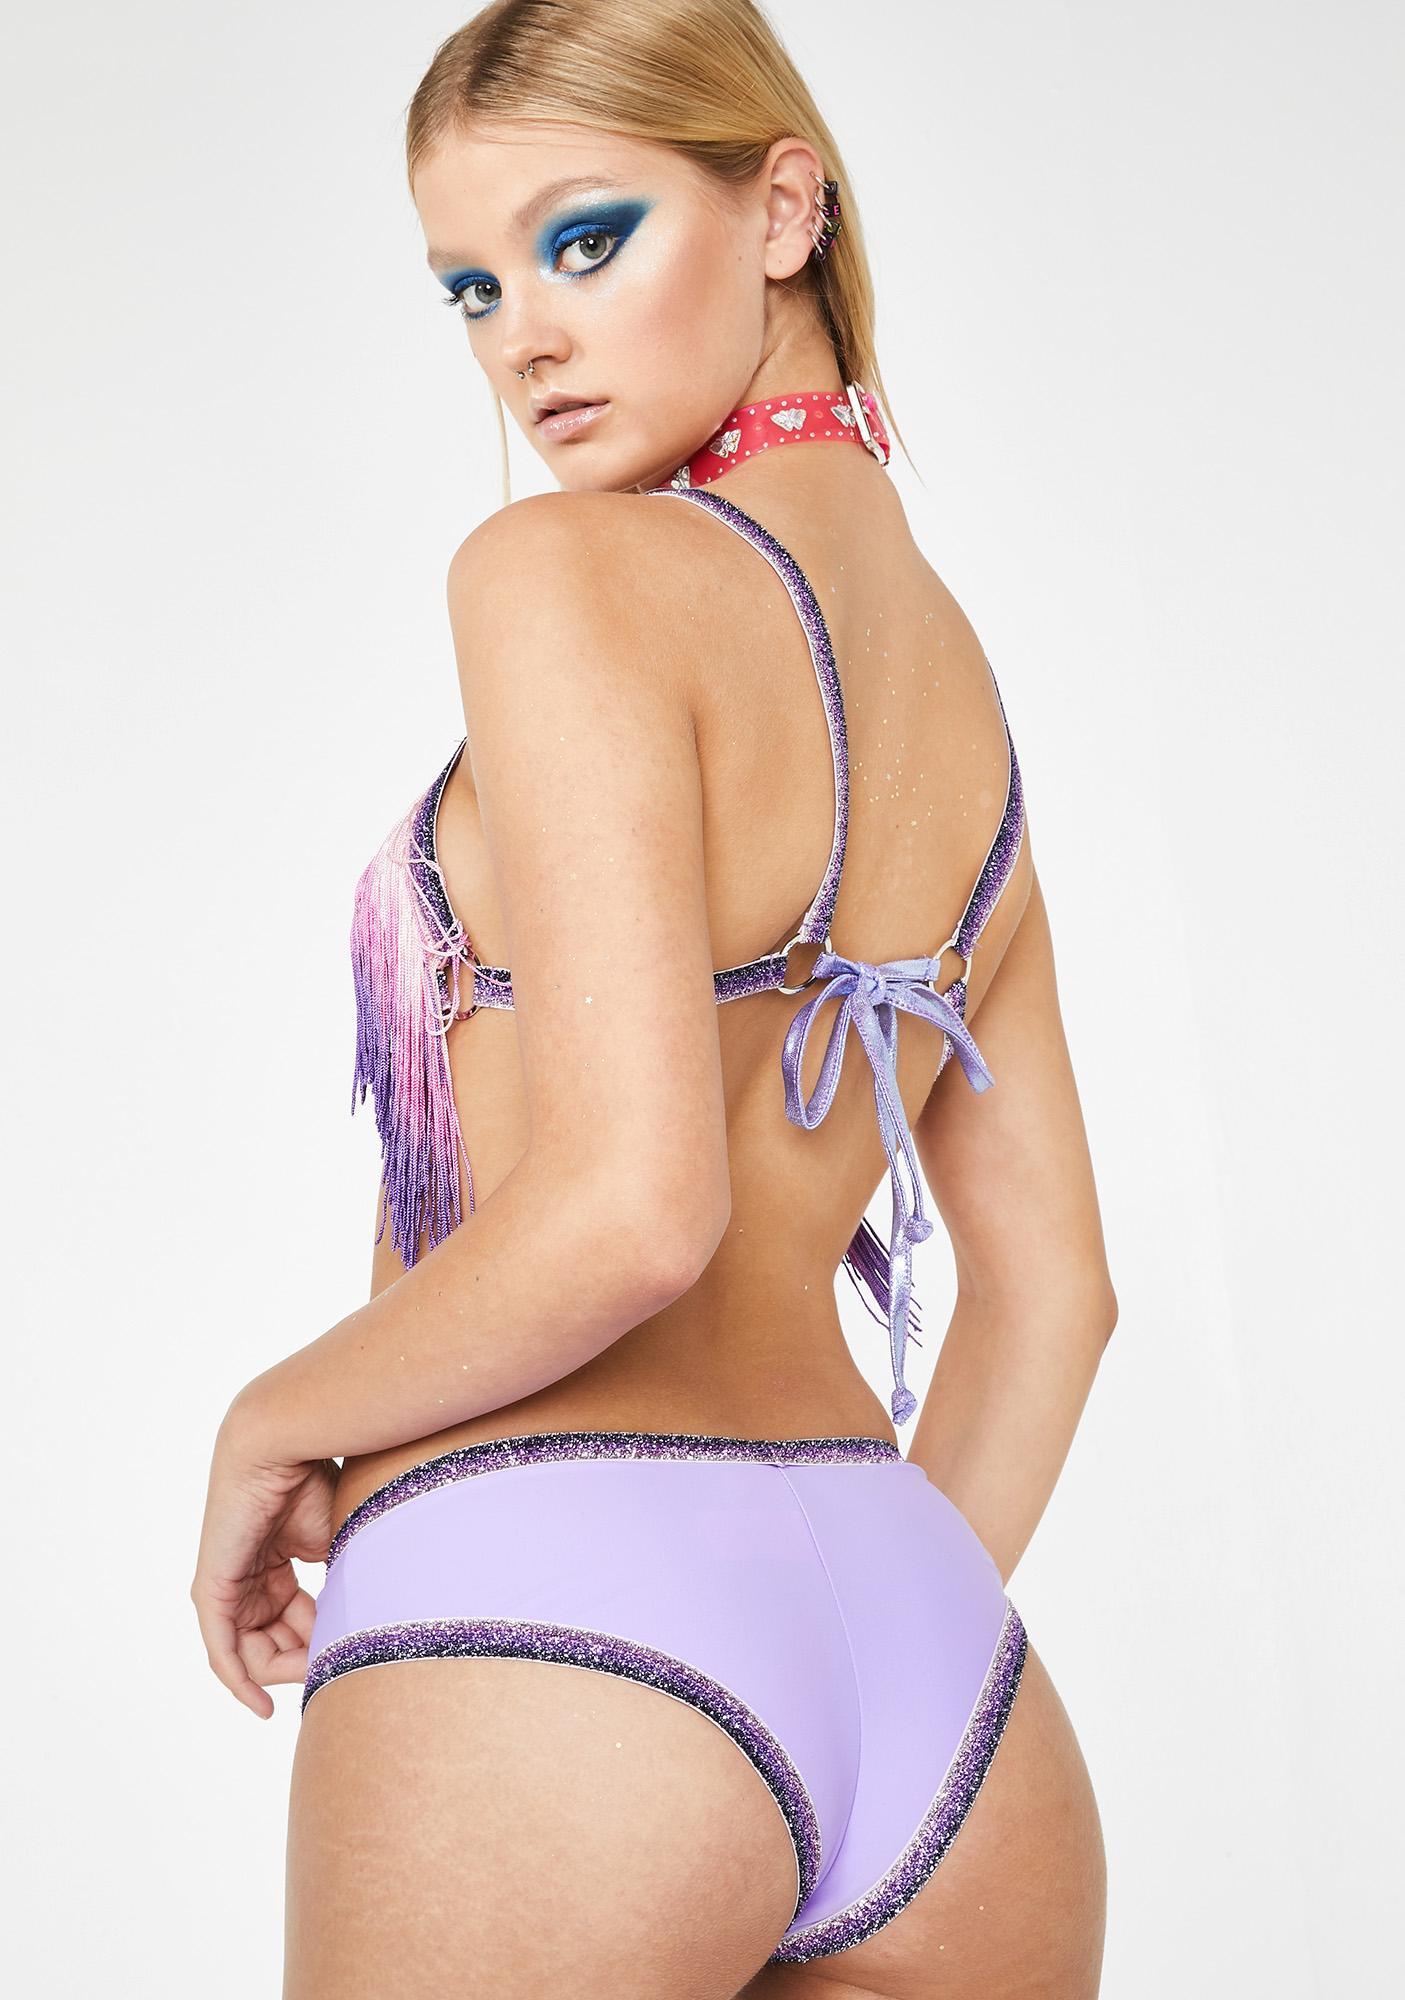 J Valentine Fairy Divine Kiss Booty Shorts